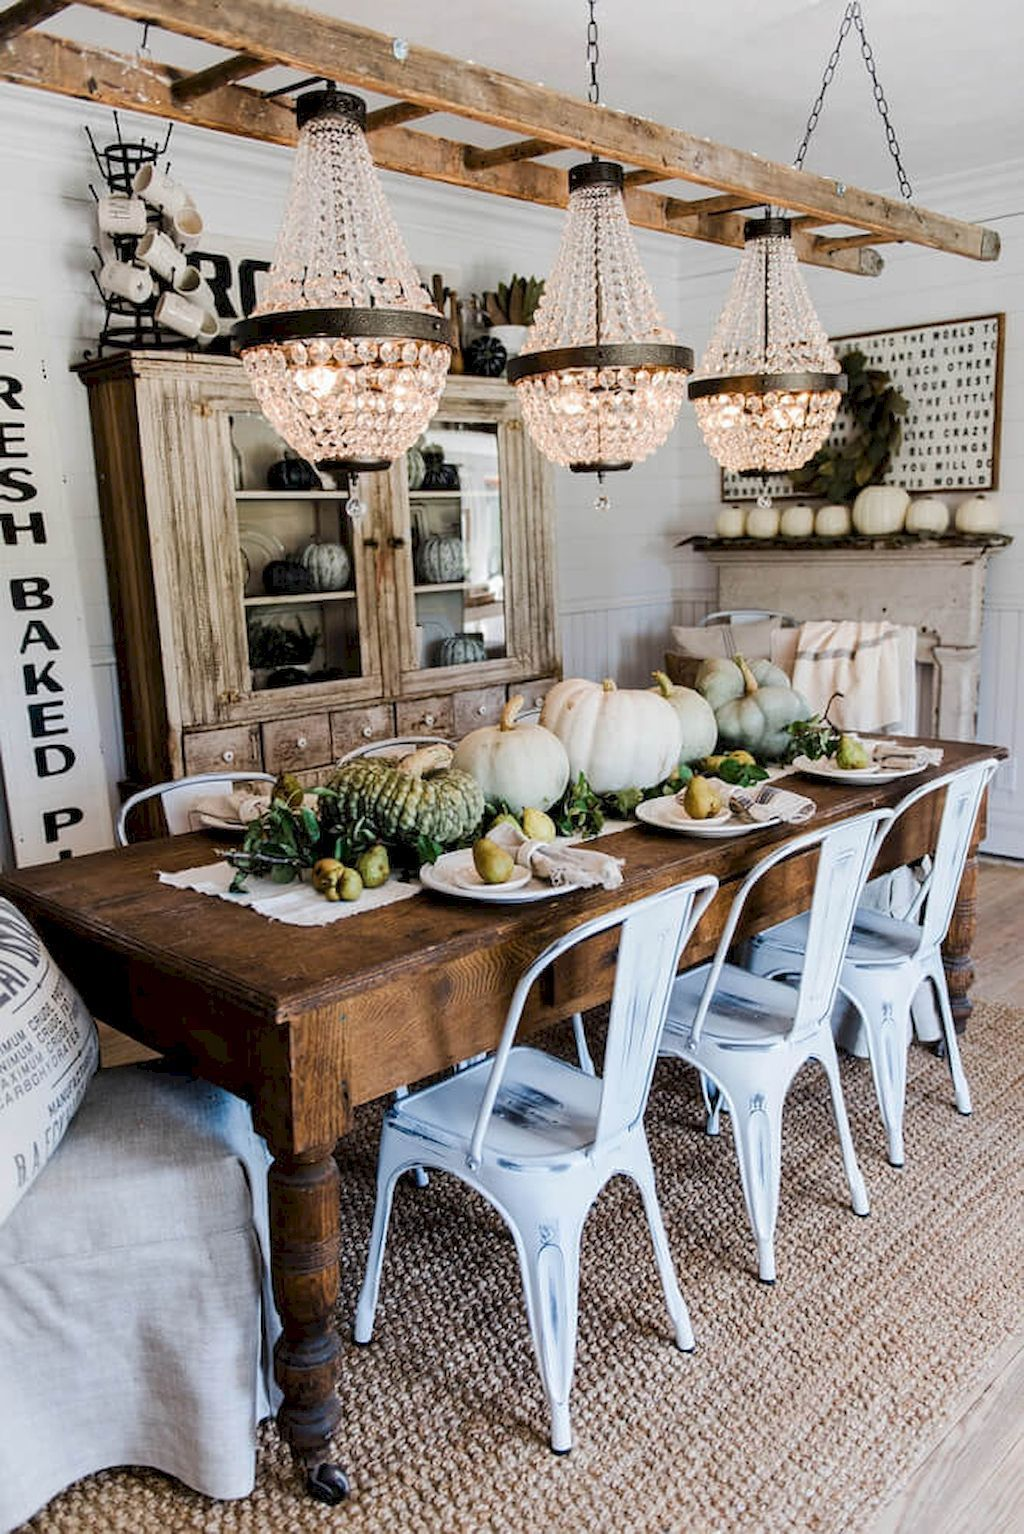 46 Popular Farmhouse Dining Room Design Ideas Trend 2019: Farmhouse Style Dining Room Table And Decor Ideas (7 (With